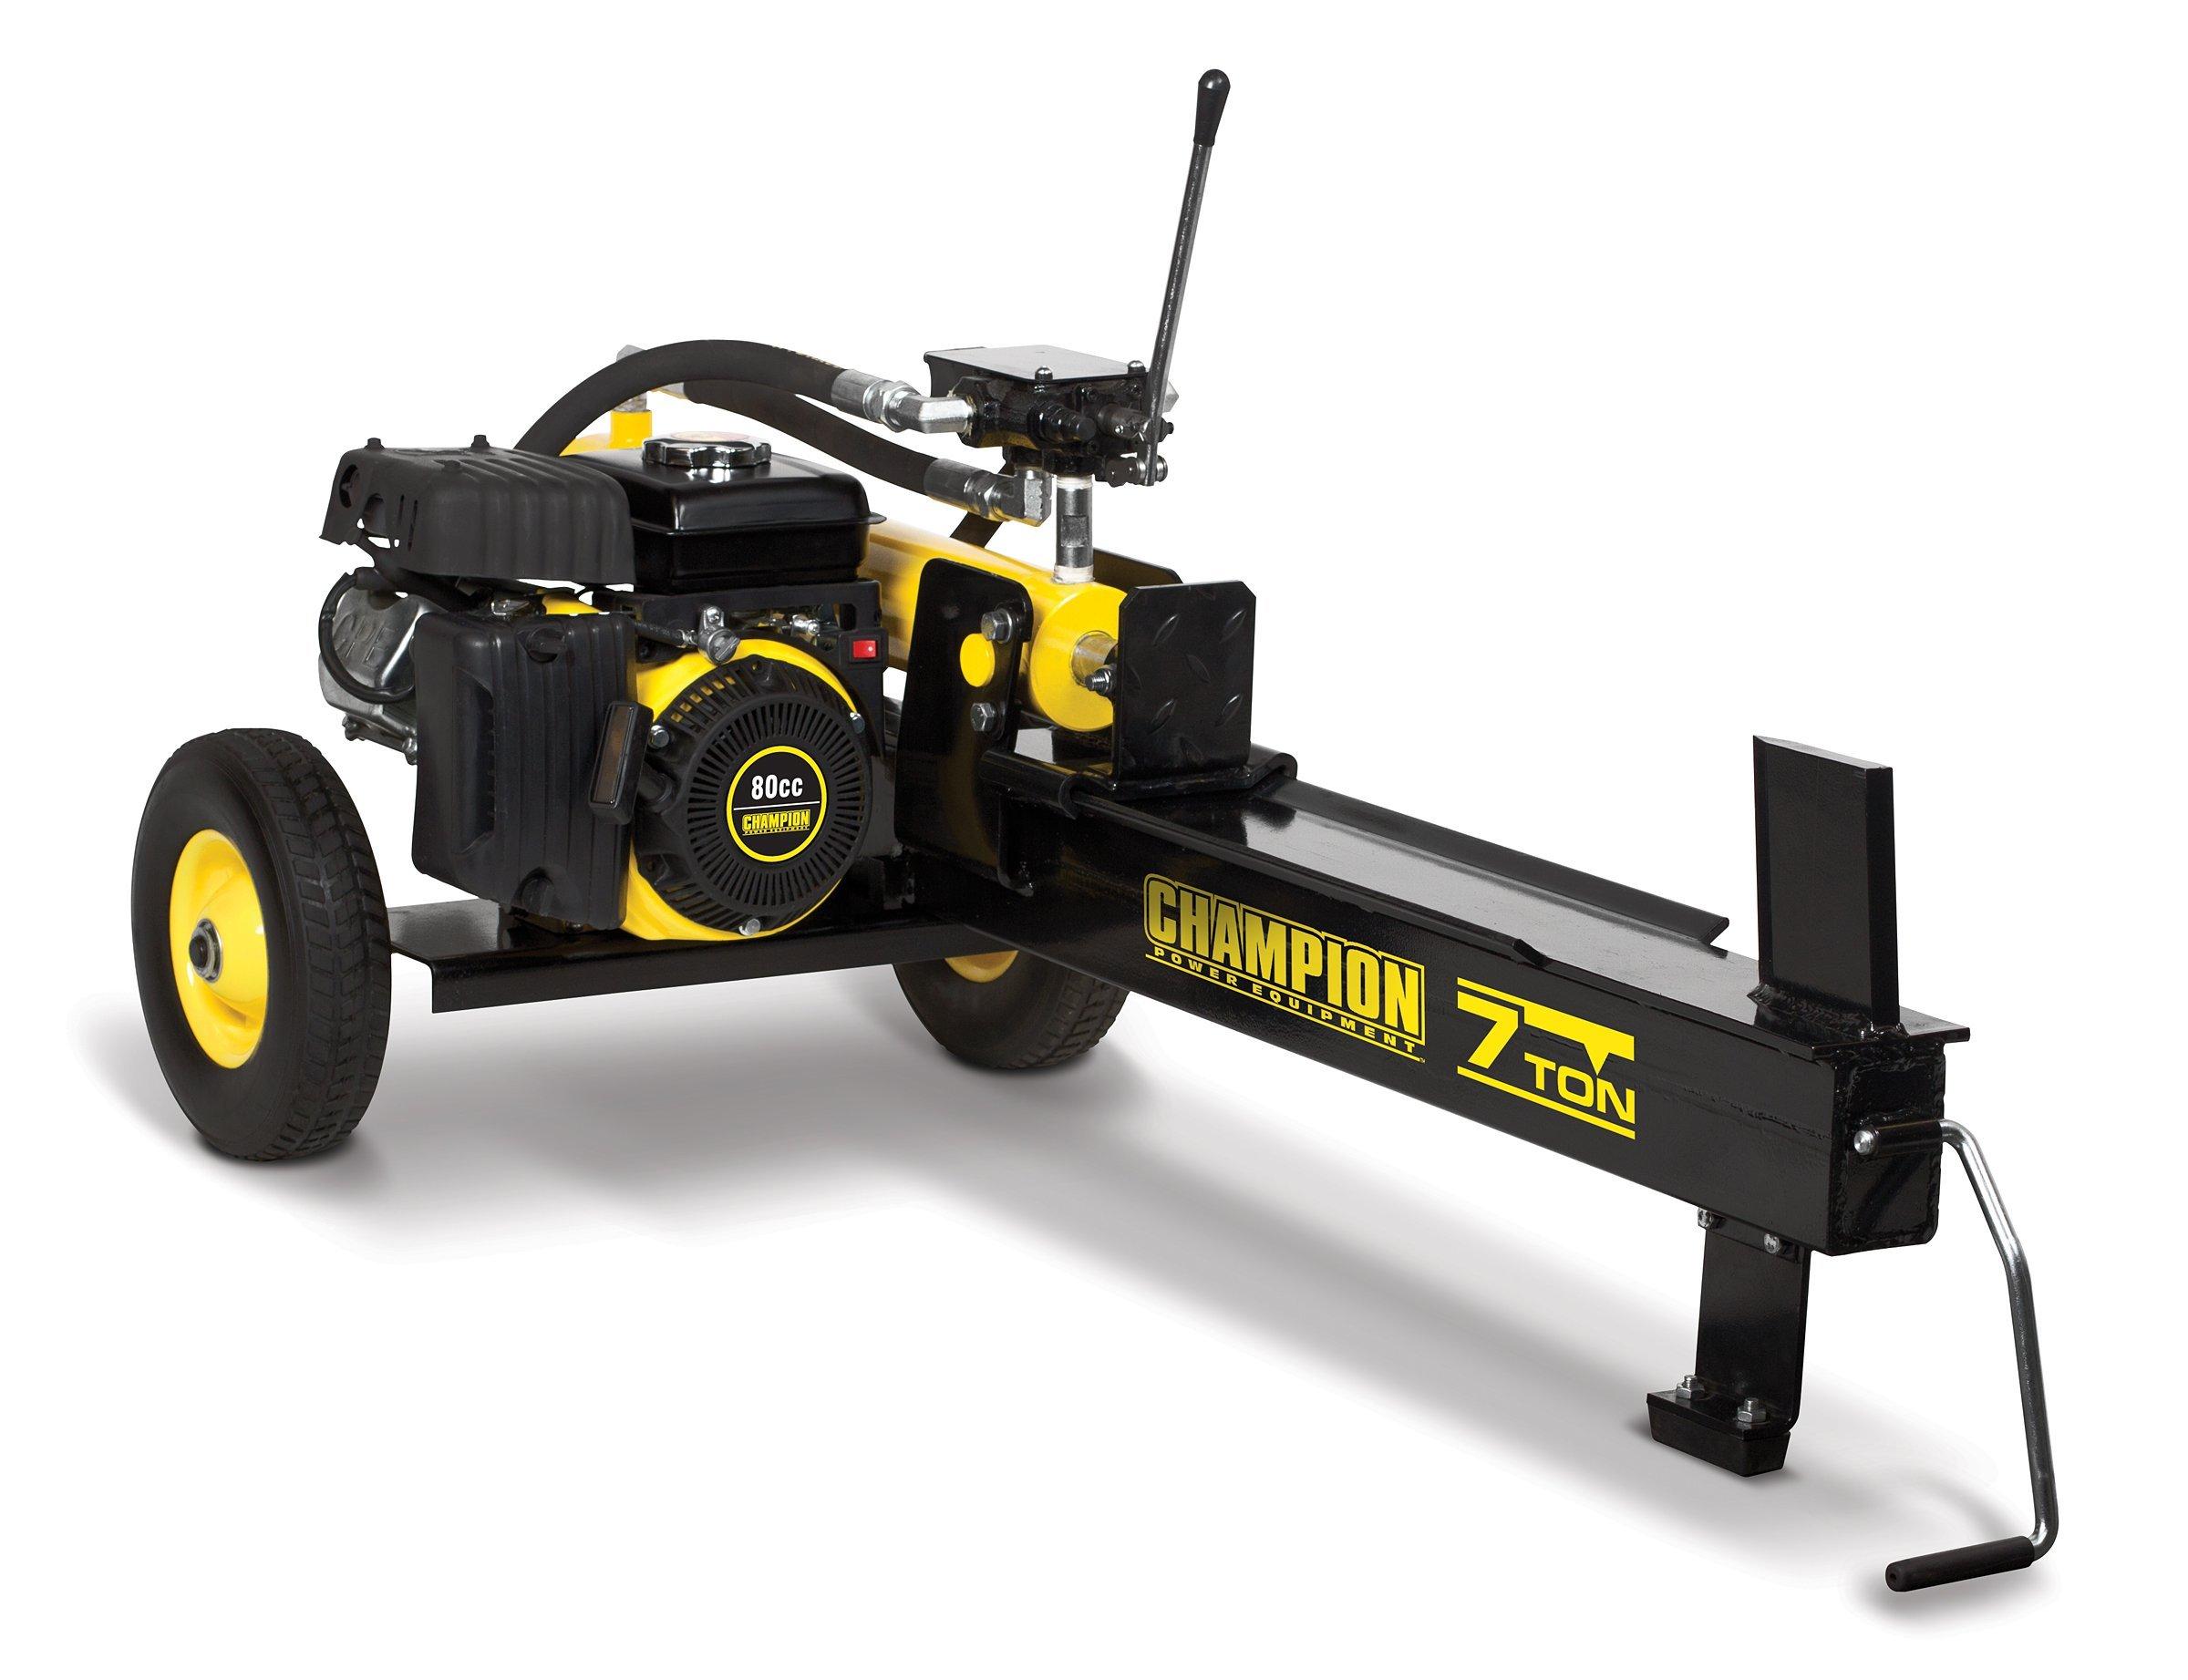 Champion 7-Ton Compact Horizontal Gas Log Splitter with Auto Return by Champion Power Equipment